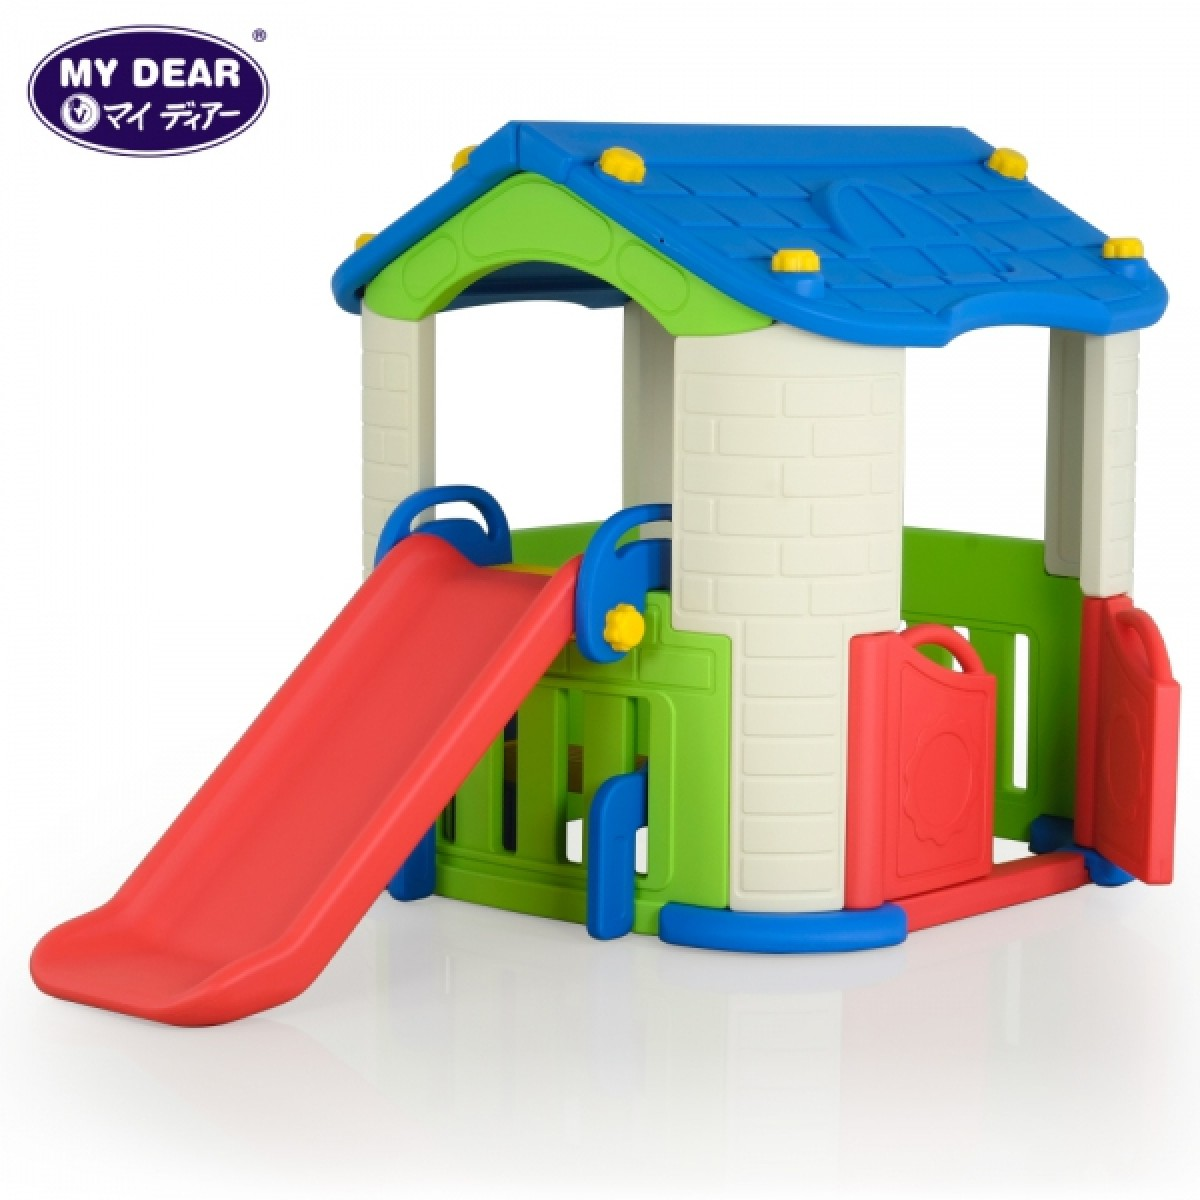 (Chd-801) Happy Playhouse With Slide - Kico Baby Center